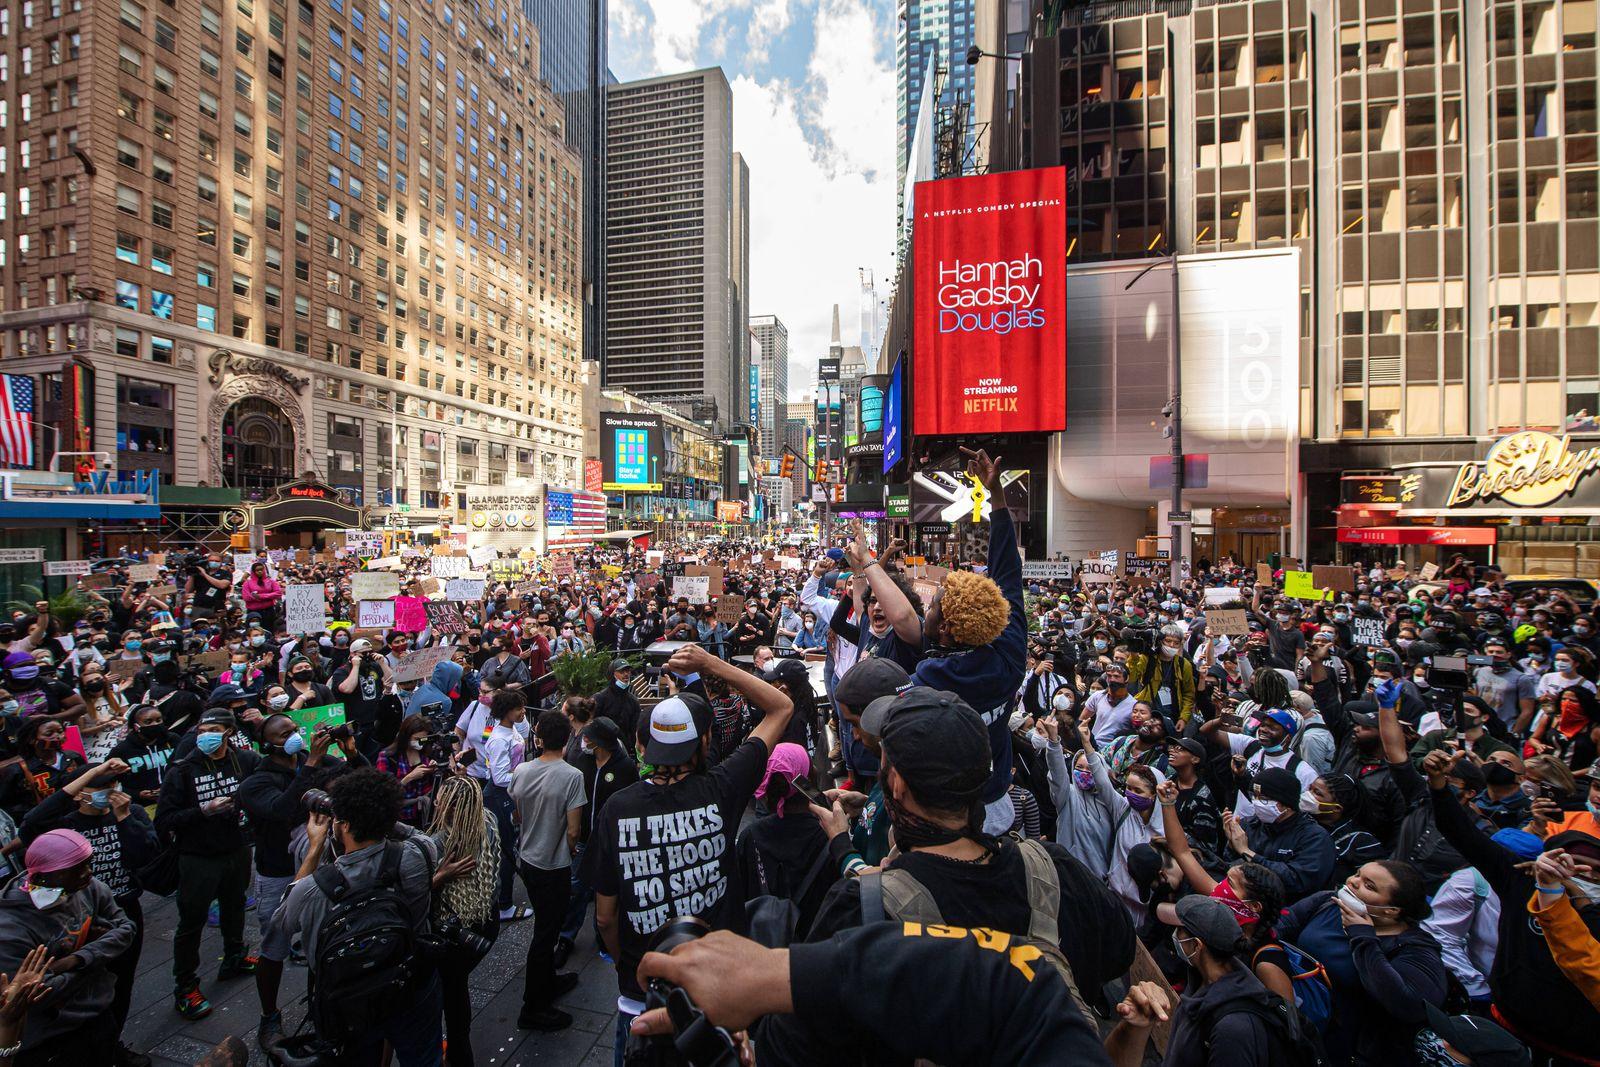 Demonstrators protest death of George Floyd